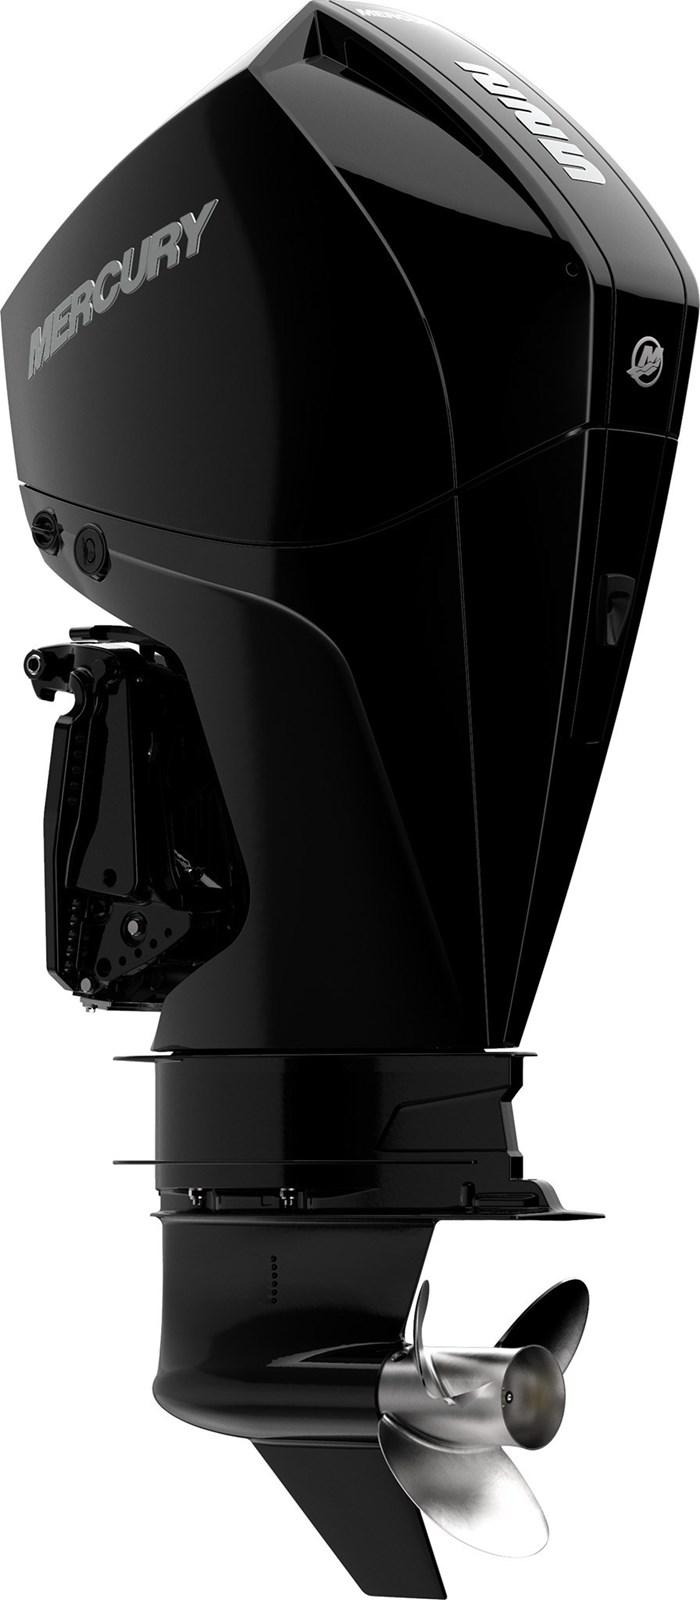 2020 Mercury 225CXL V-6 4-Stroke DTS Photo 9 of 23